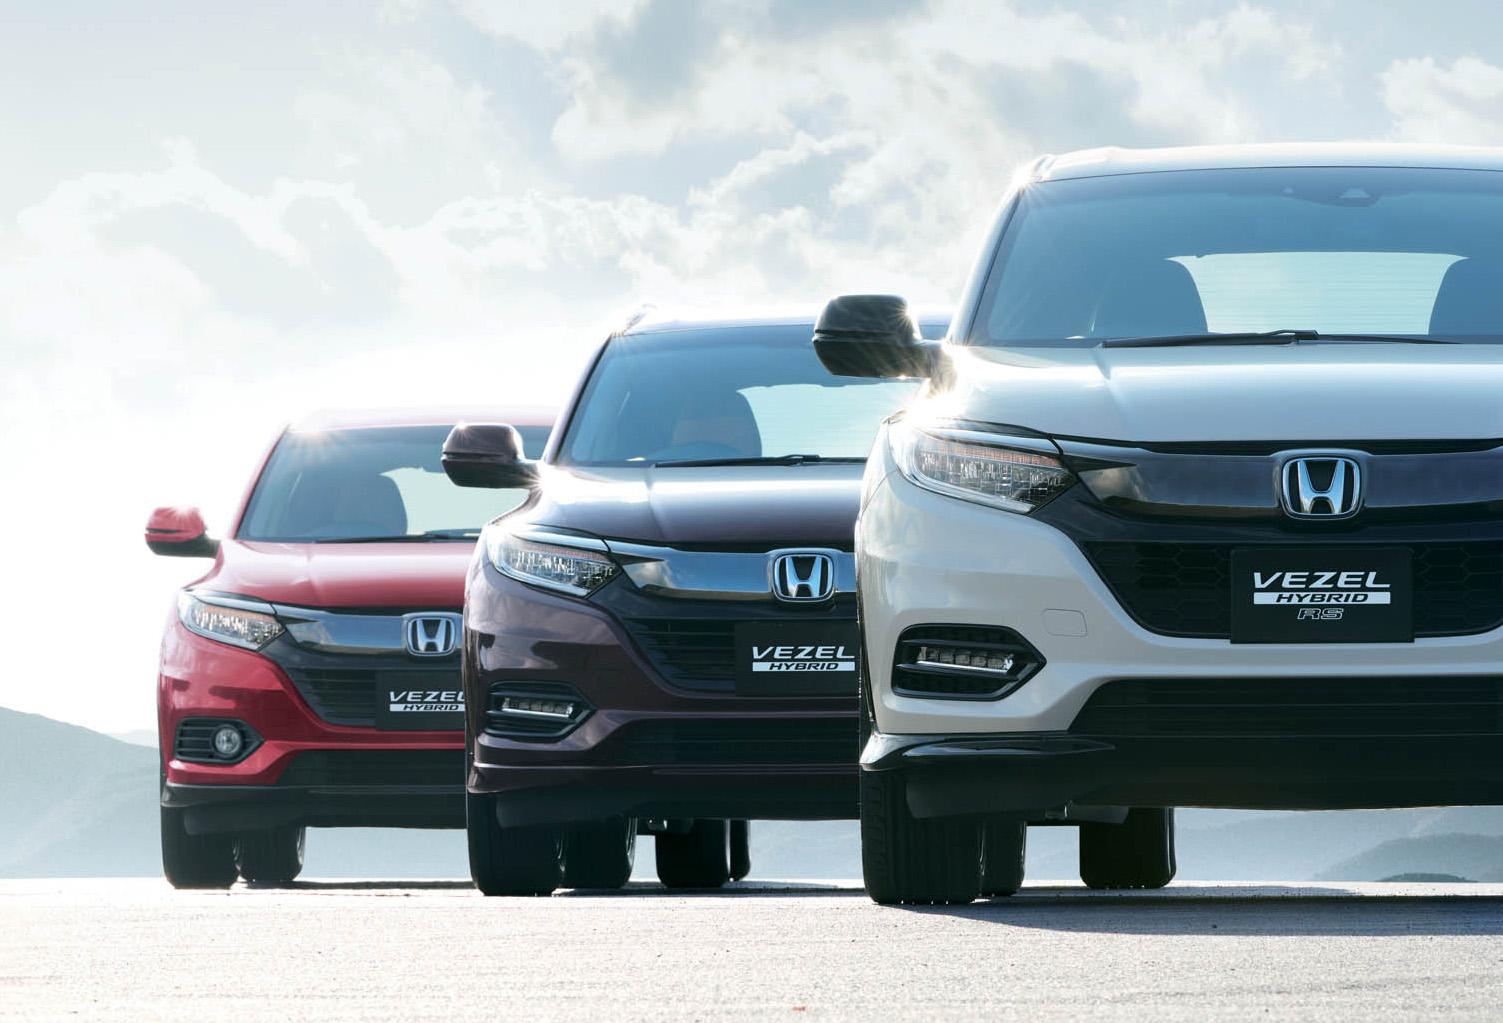 2019-honda-hr-v-facelift-launched-in-japan-as-new-vezel-123615_1.jpg